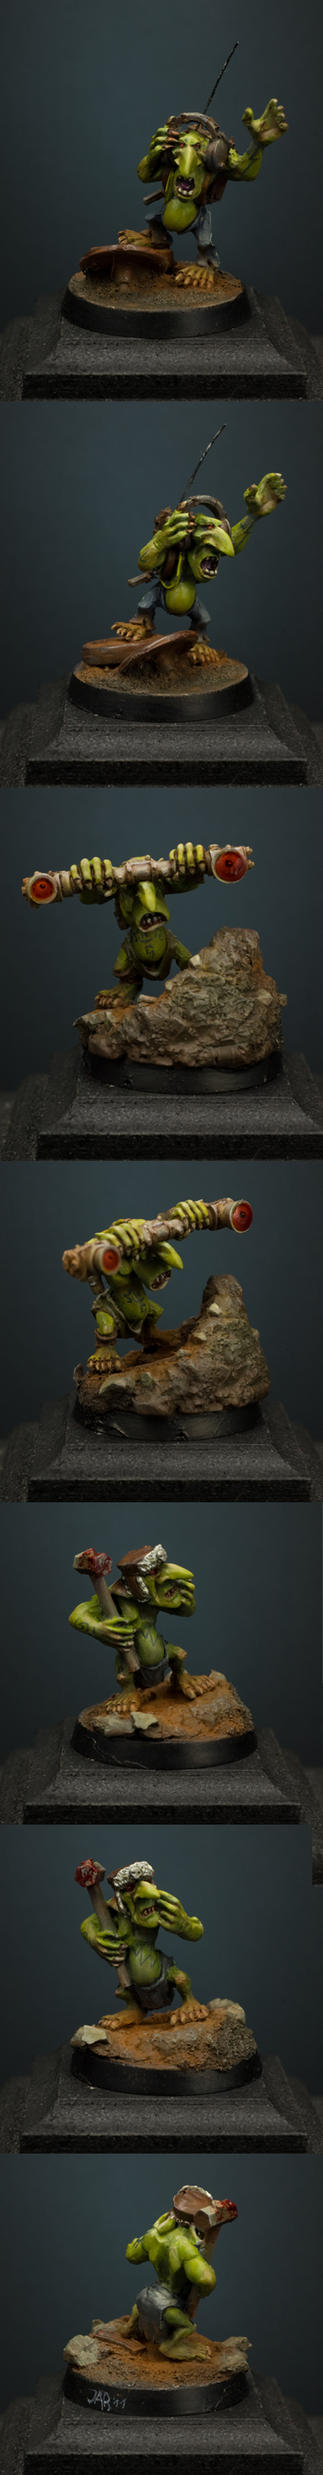 Forgeworld Grots by MassIveVoodoo